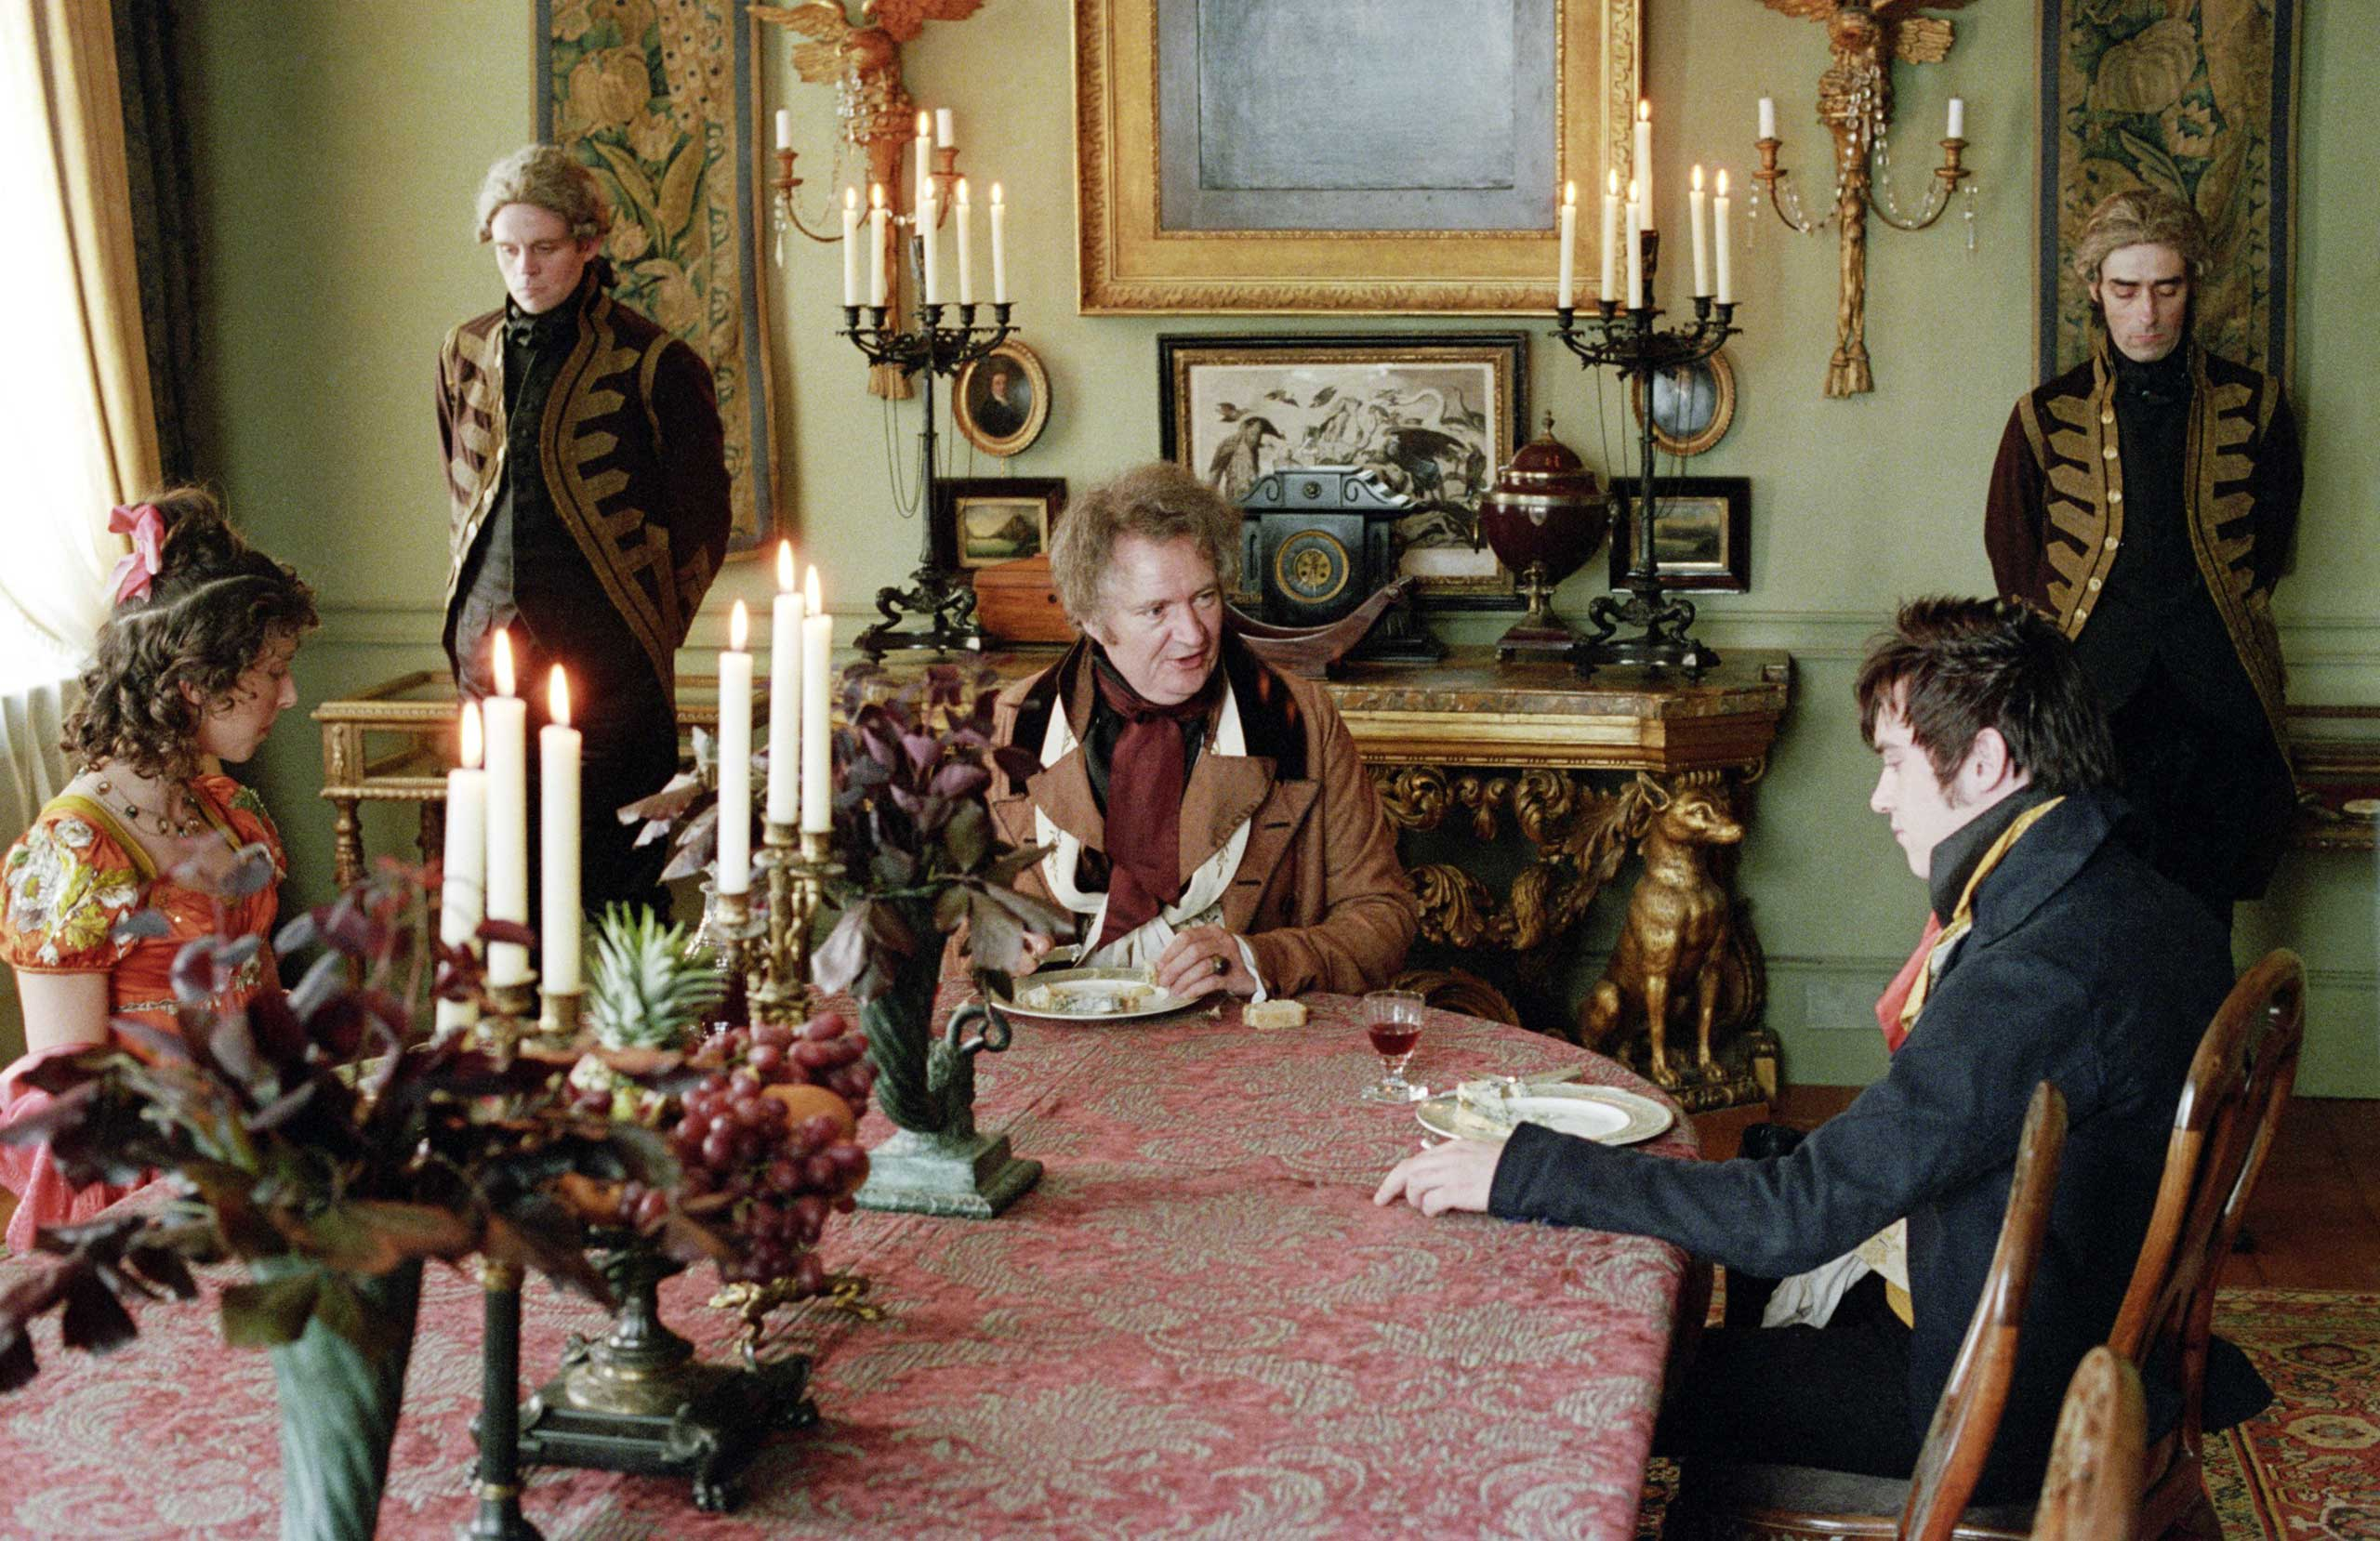 Hunter (left) had a small role as Maria Osborne in the 2004 film Vanity Fair